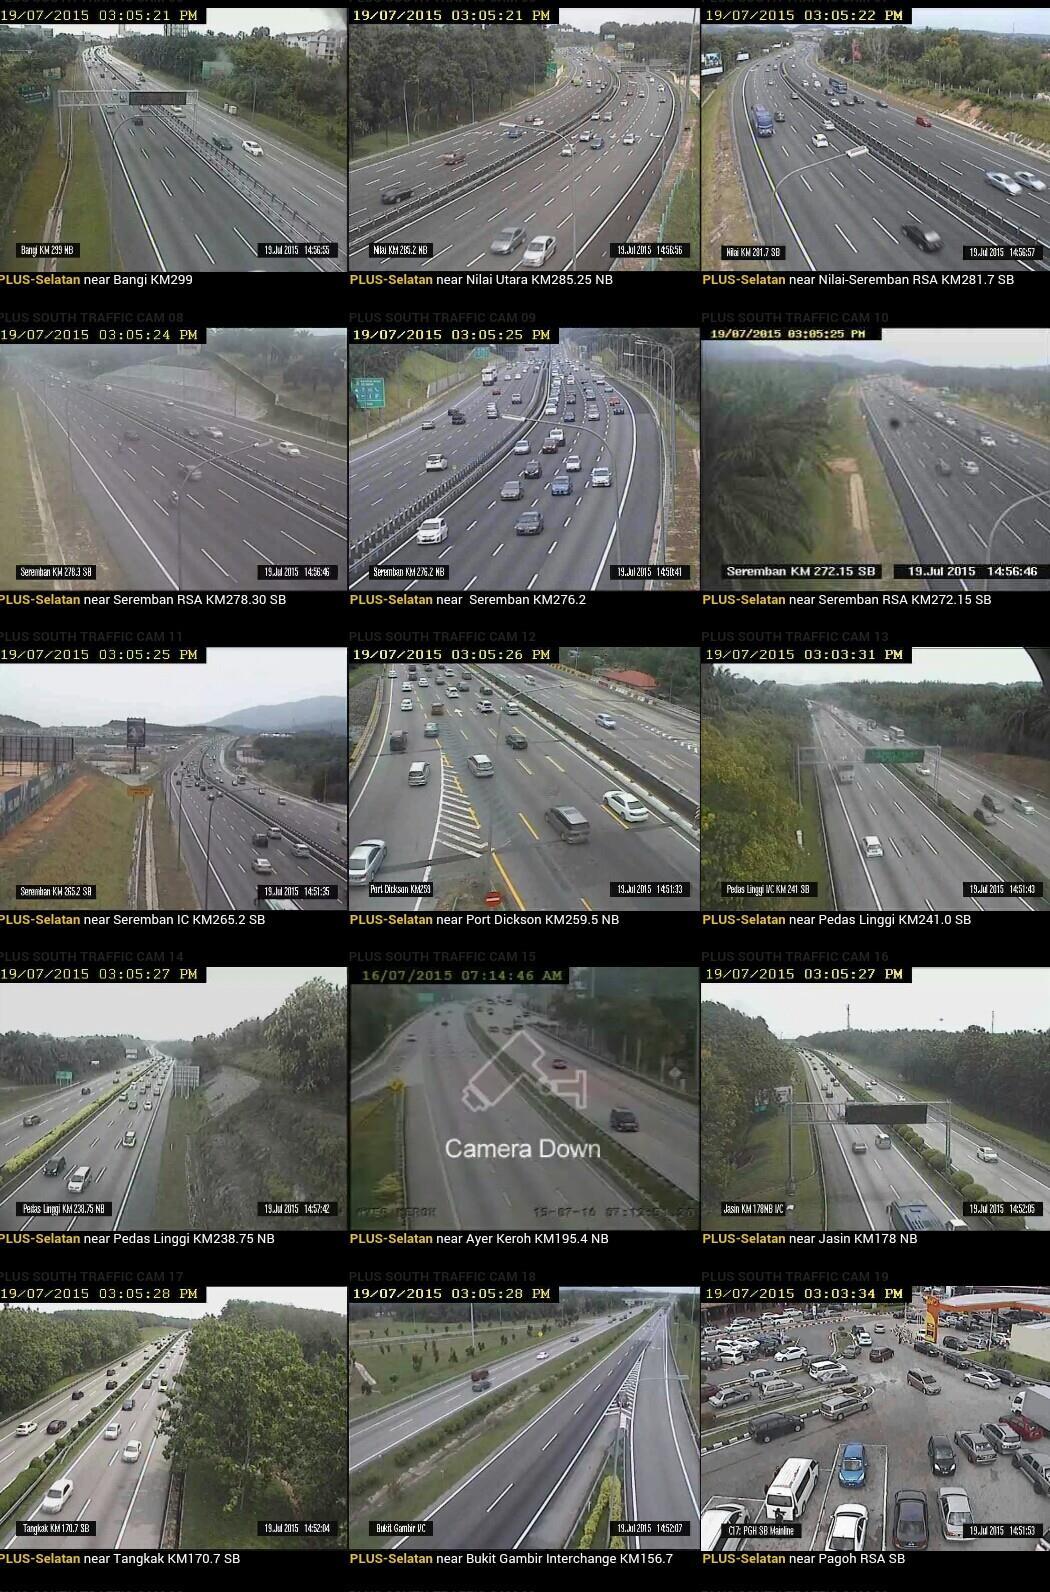 Jalanow com - LPT2 ECE2 Traffic CCTV (Lebuhraya Pantai Timur - Phase